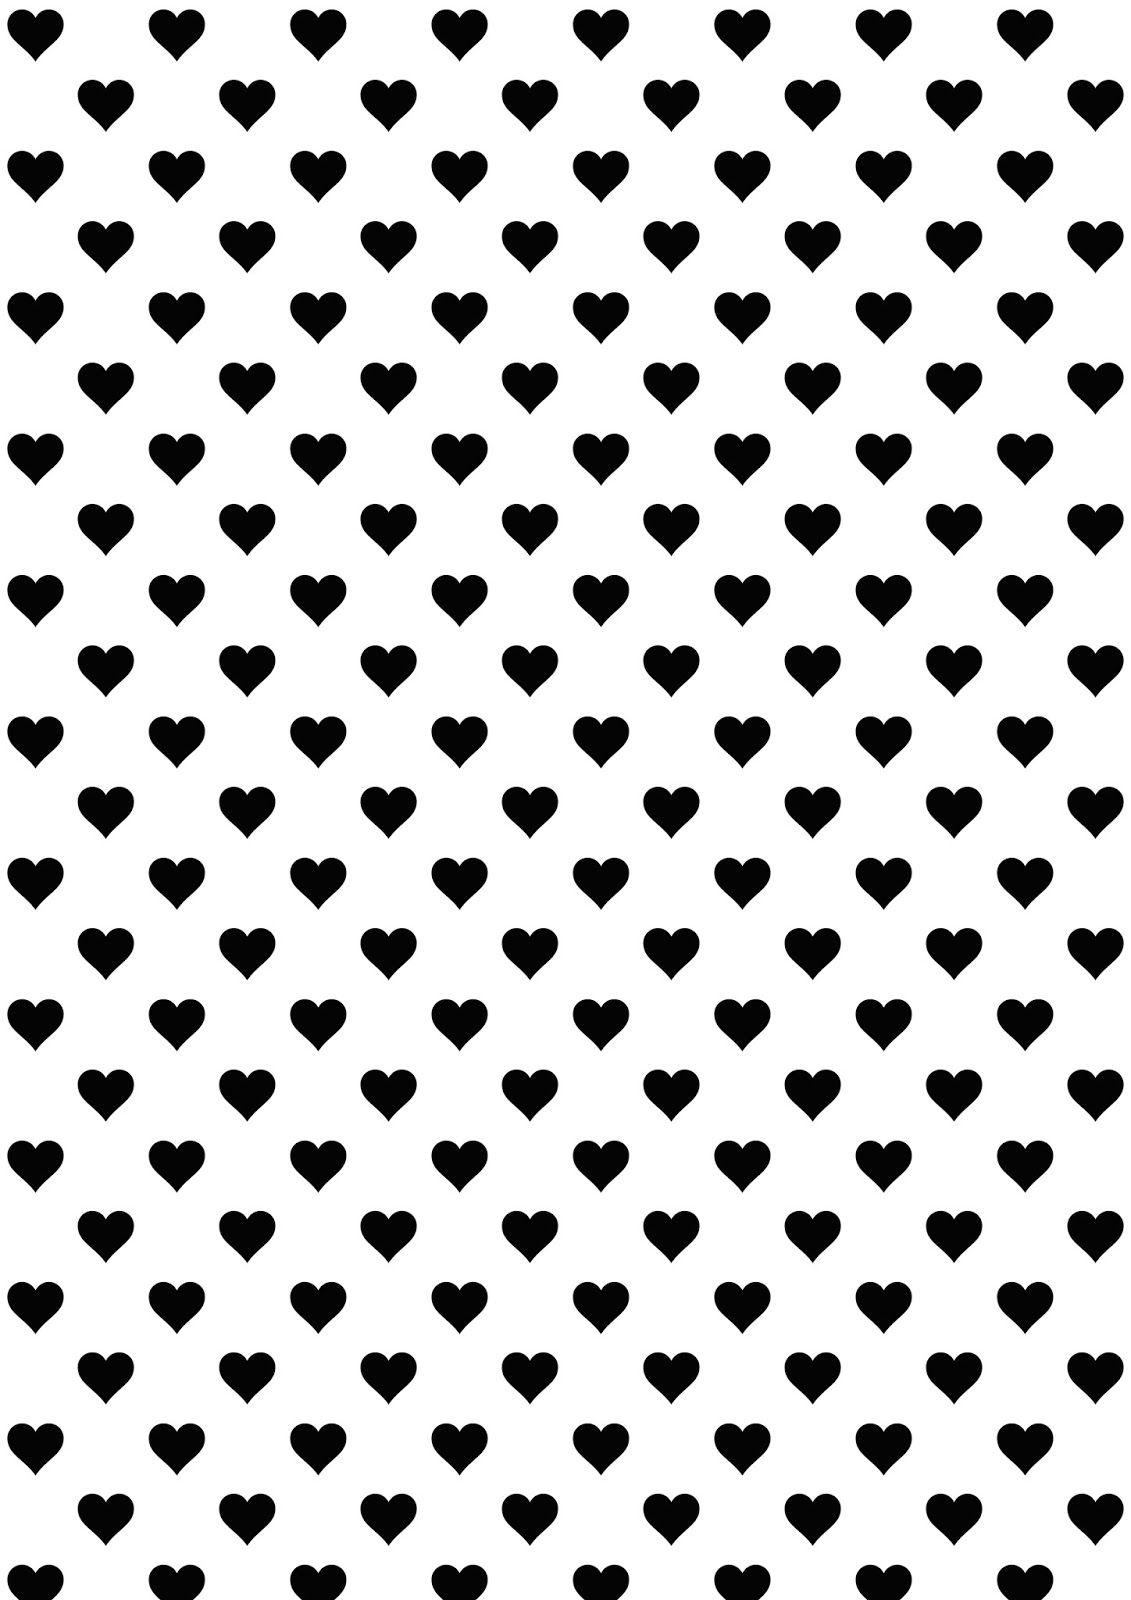 MeinLilaPark DIY Printables And Downloads Free Digital Heart Scrapbooking Paper